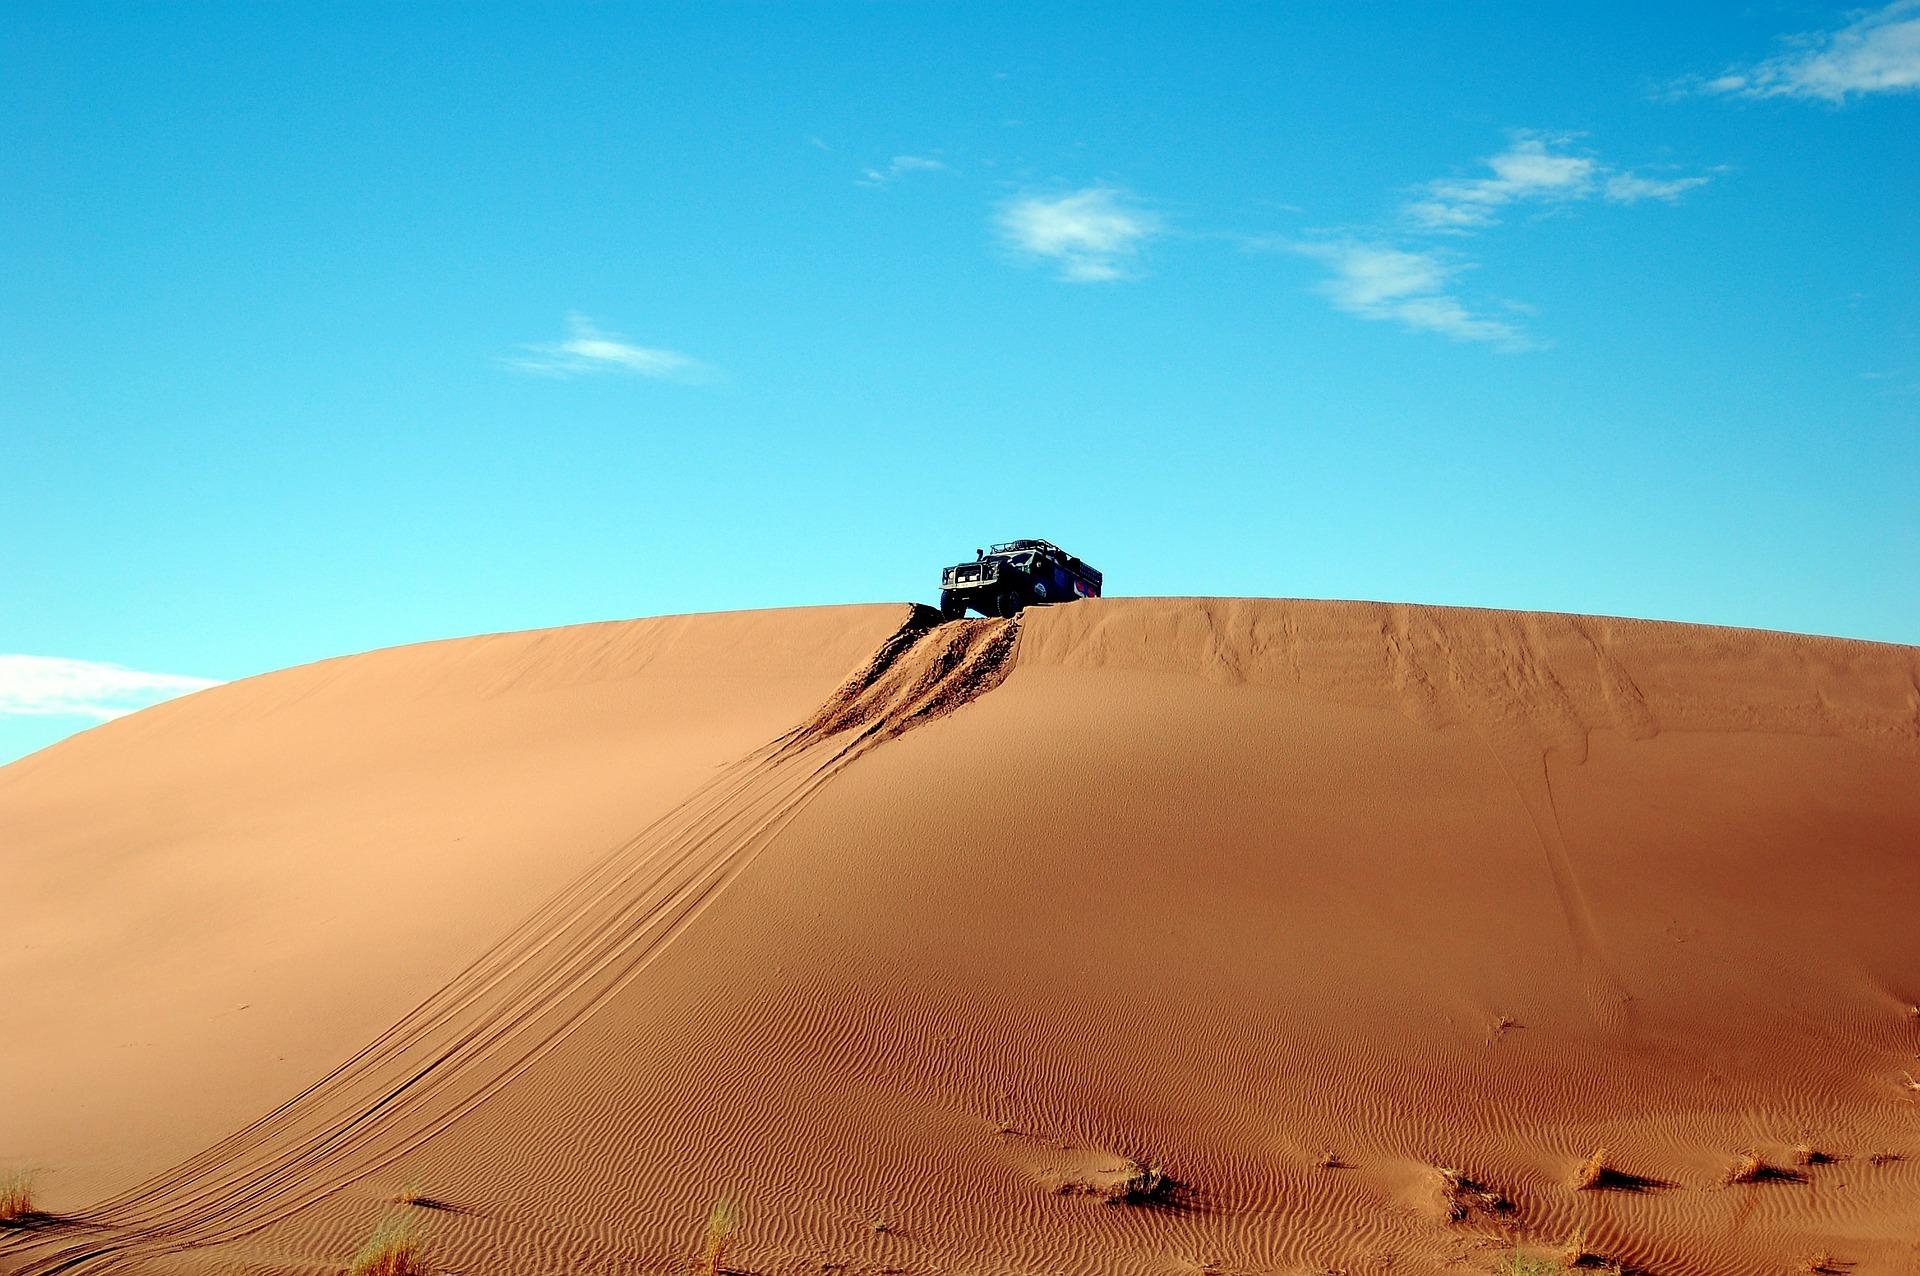 désert, Dune, voitures, sable, Sky, risque, Bleu - Fonds d'écran HD - Professor-falken.com